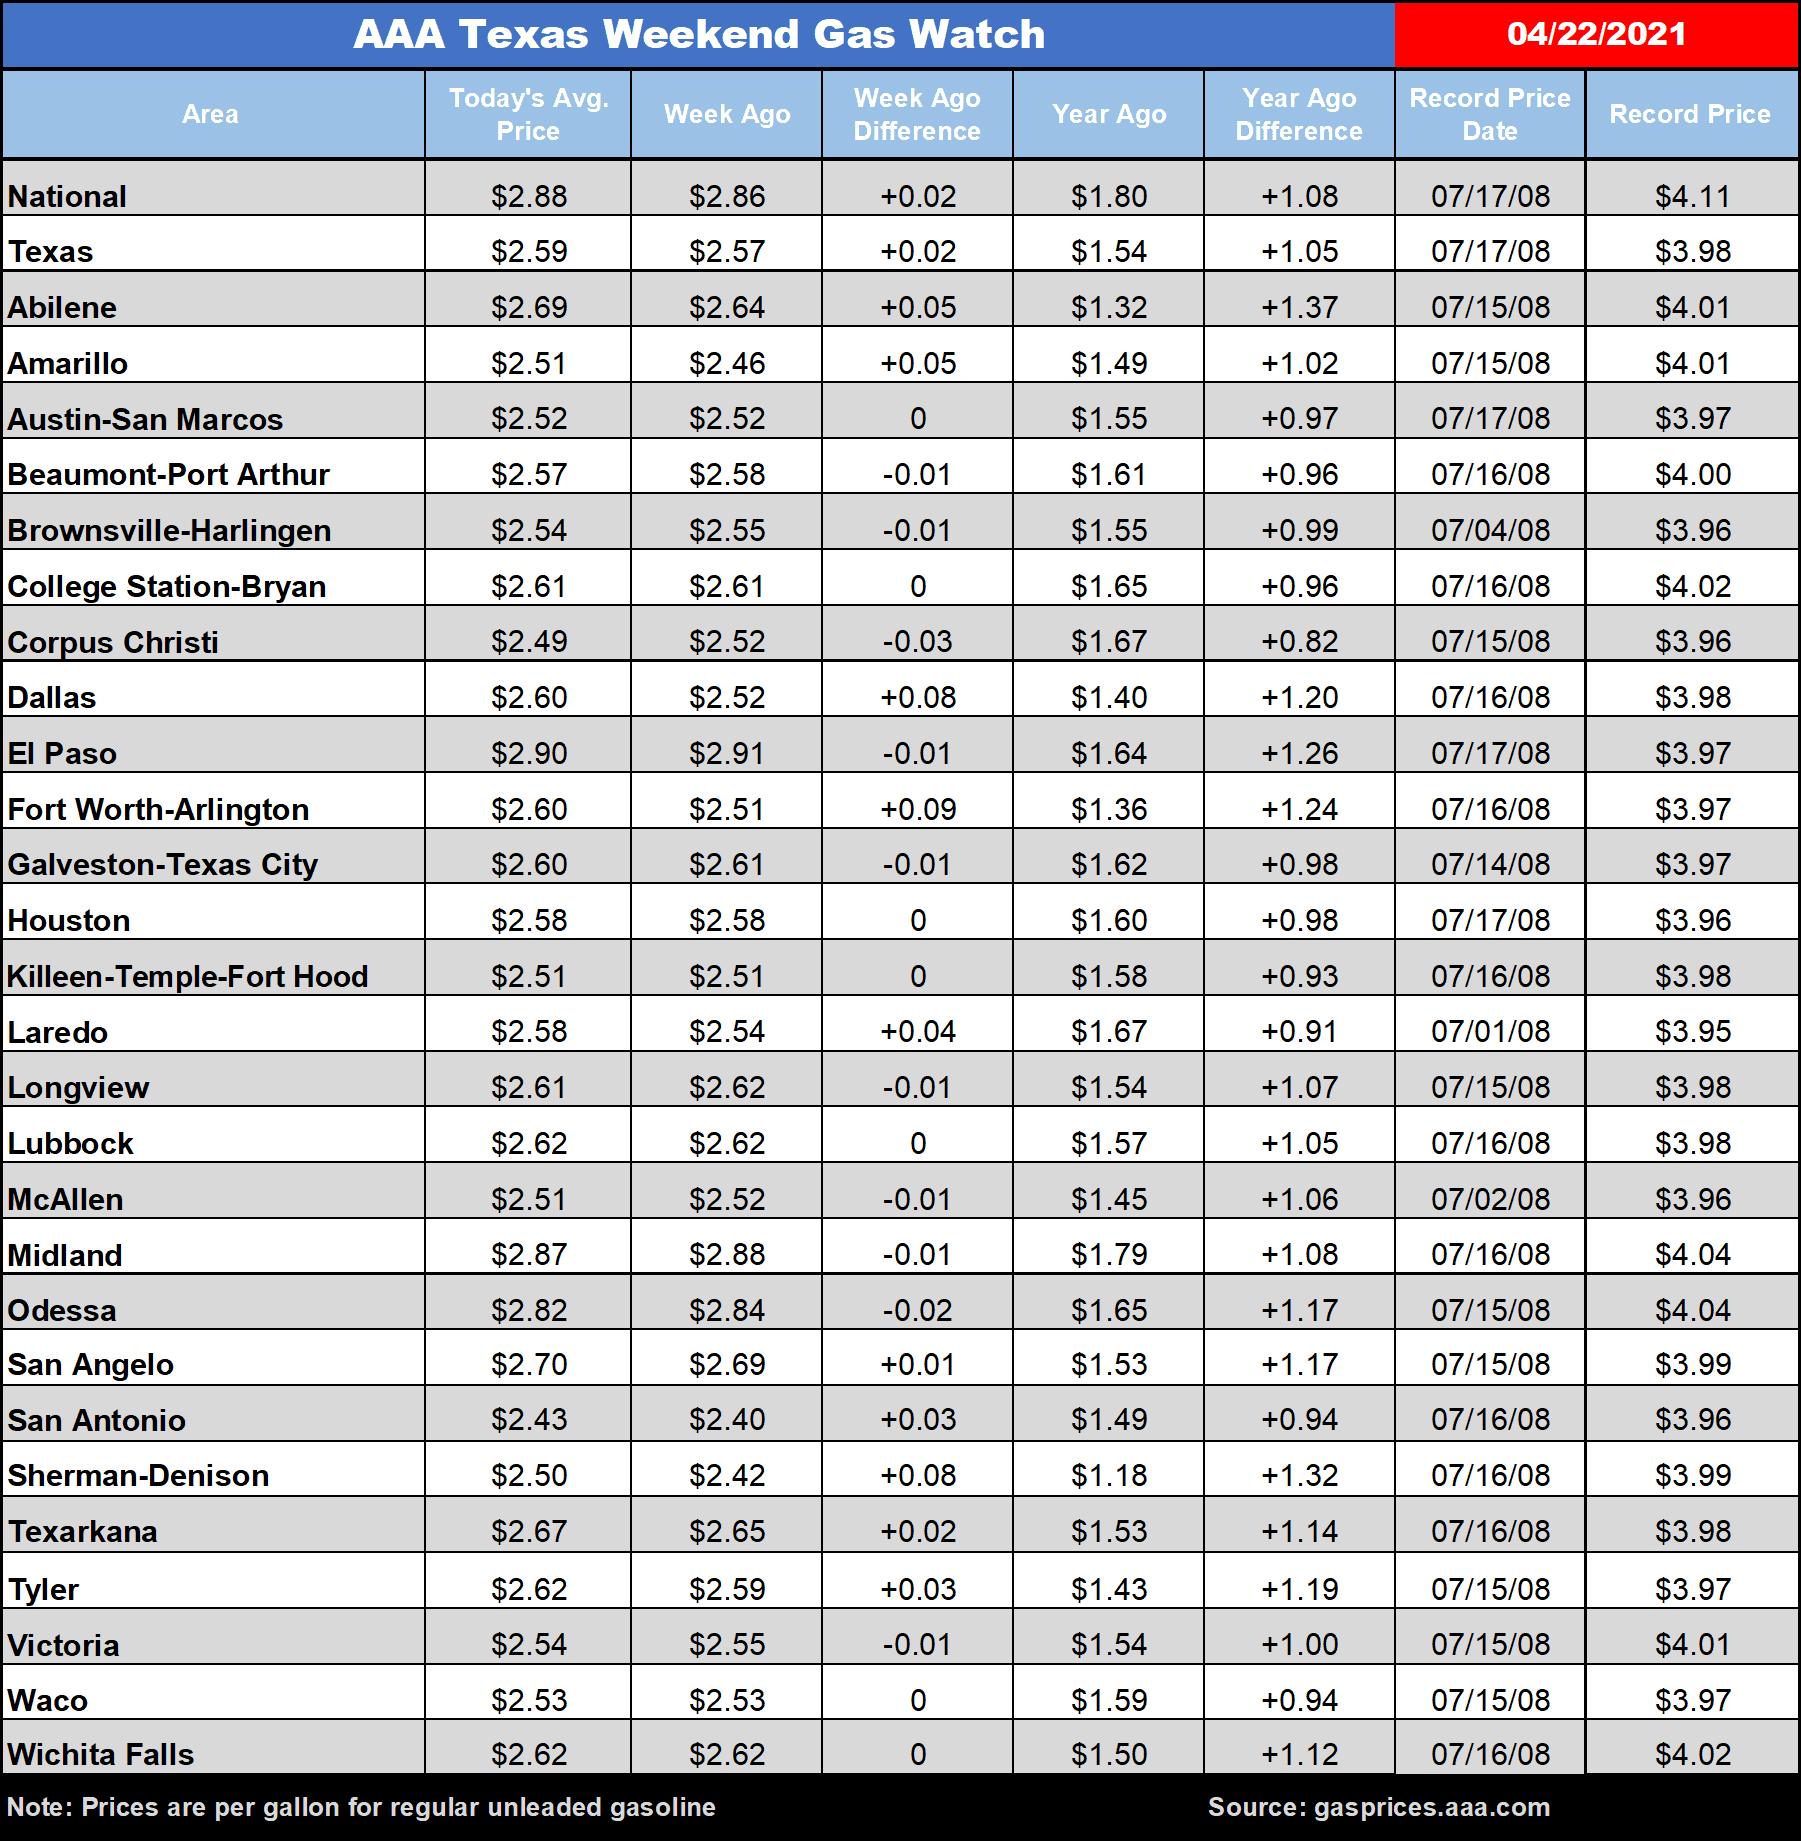 Texas gas averages